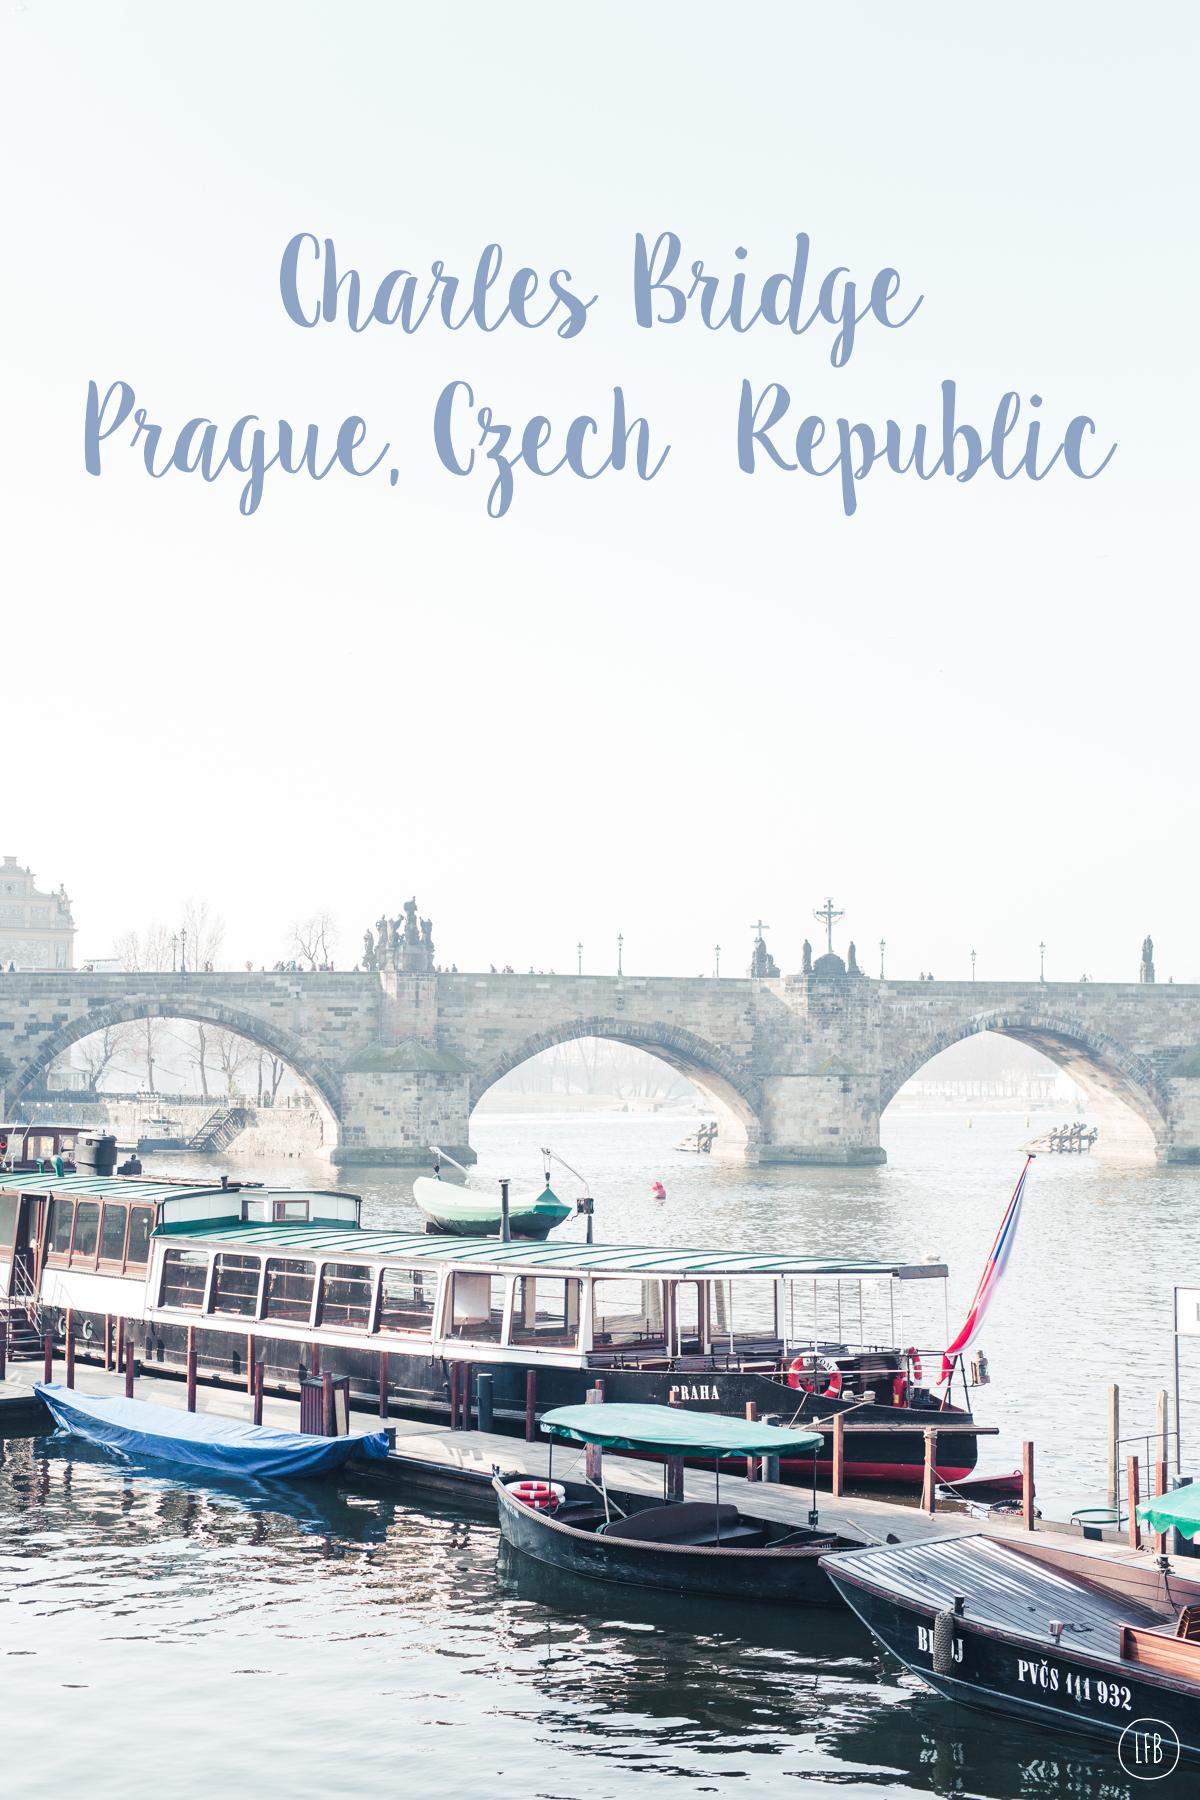 Charles Bridge, Prague - taken by Rae Tashman - lovefromberlin.net